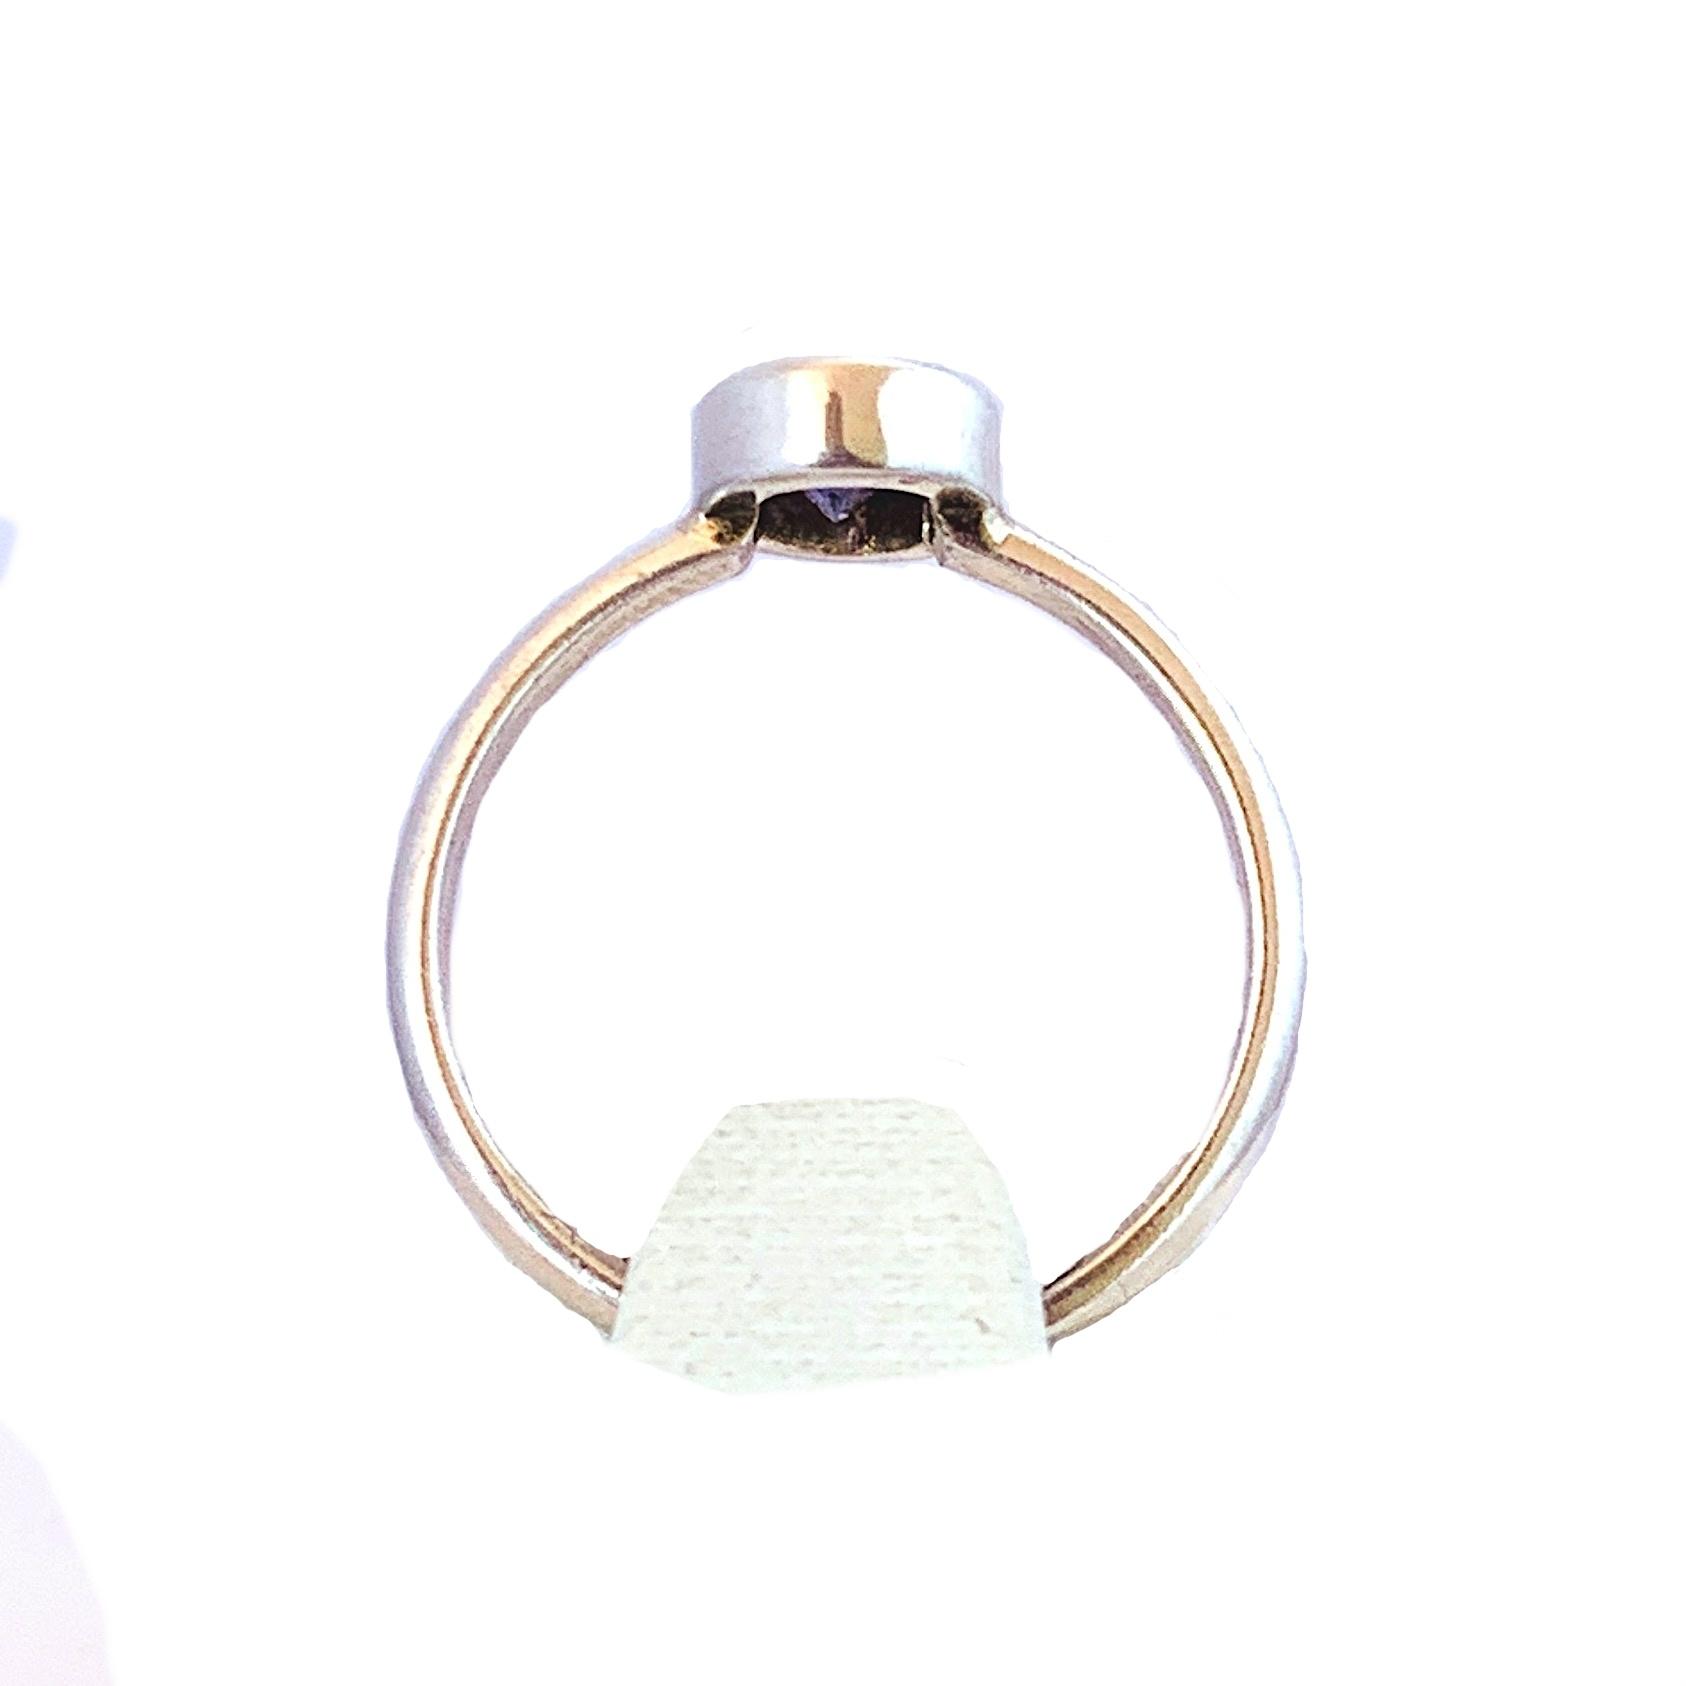 Kiliaan Jewelry Collectie Tanzanite ring